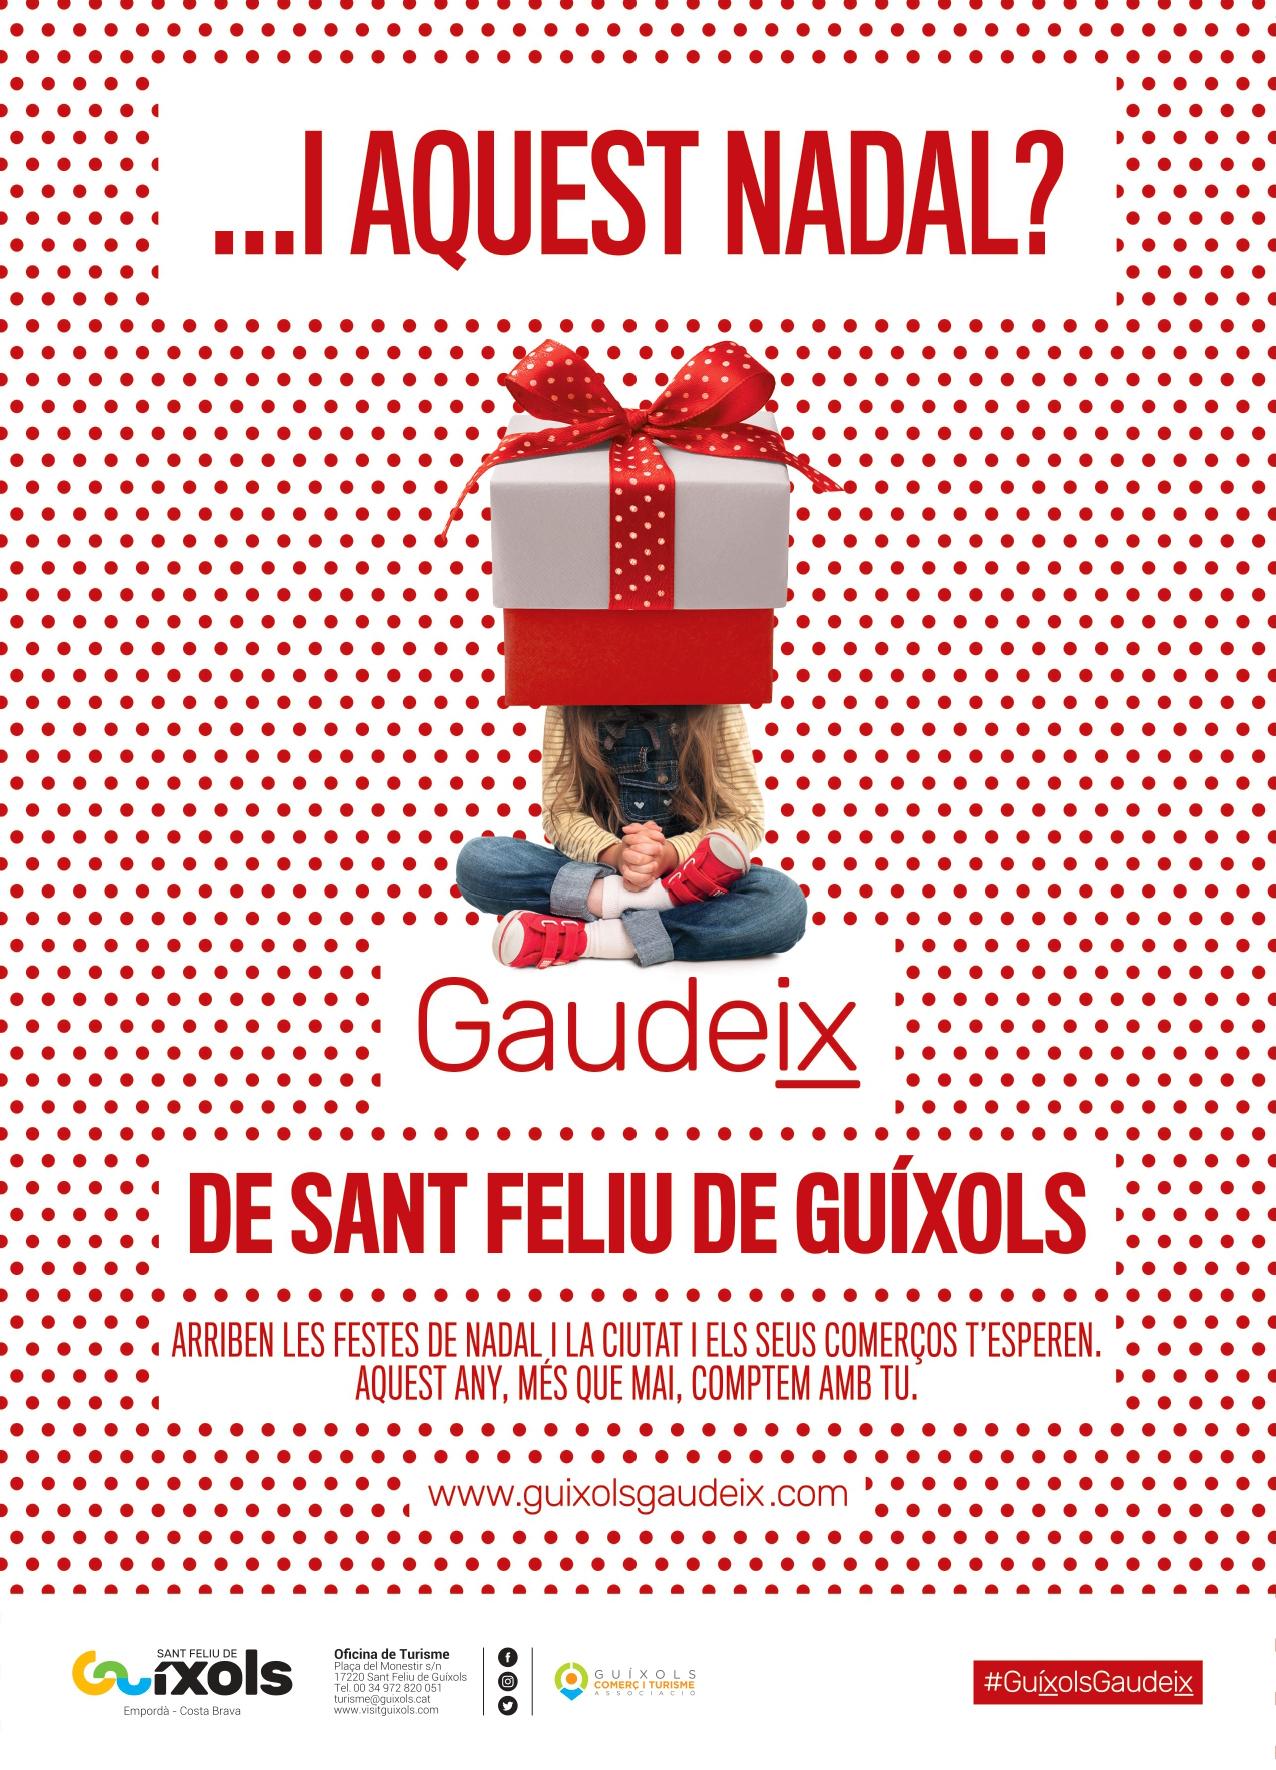 anunci butlleti 210x297 guixols gaudeix nadal 01 page-0001